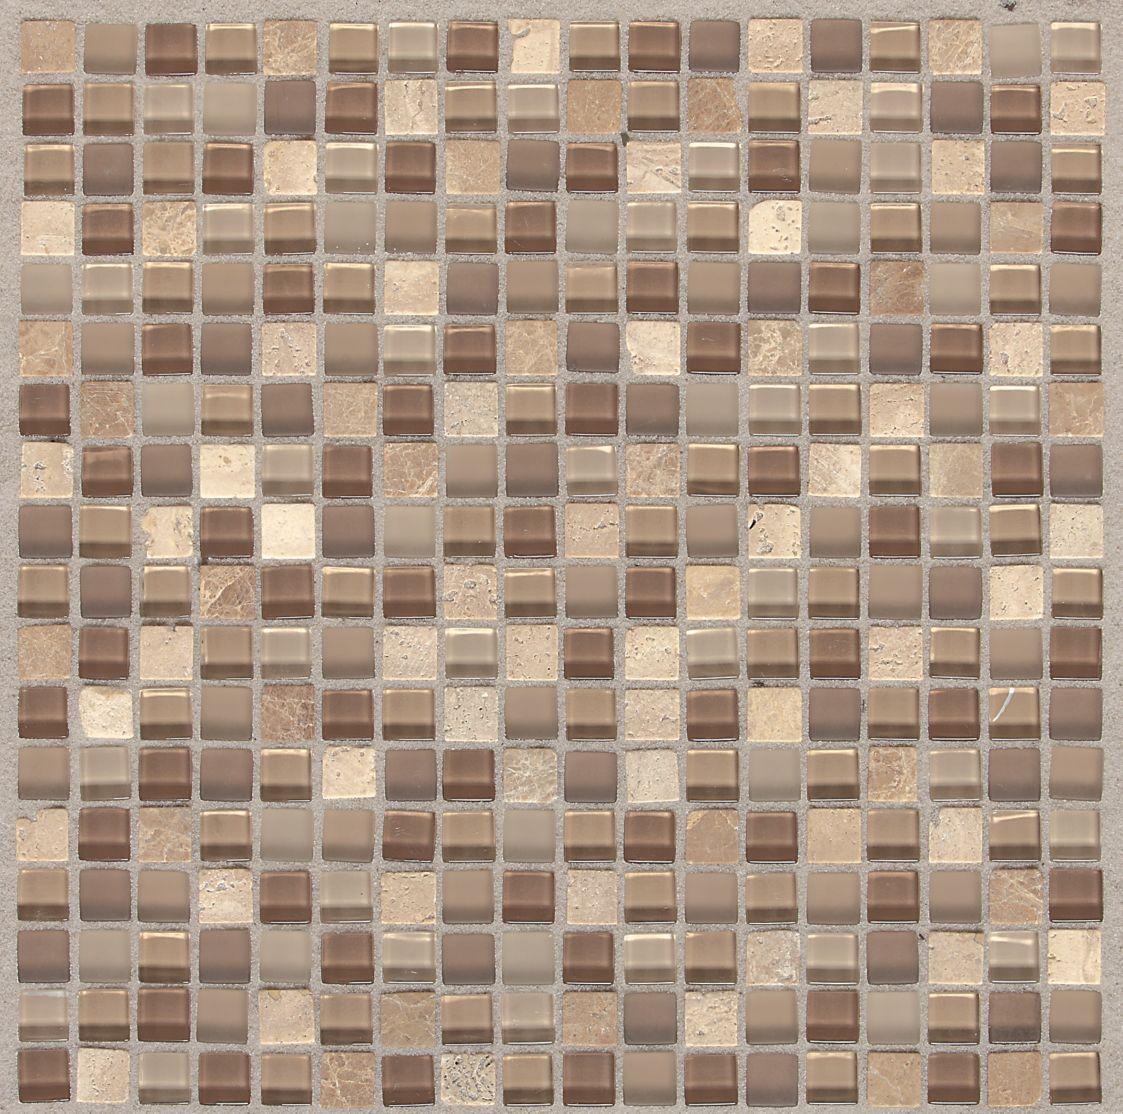 CeramicPorcelainTile Maraval Stone Pecan Taupe  thumbnail #1